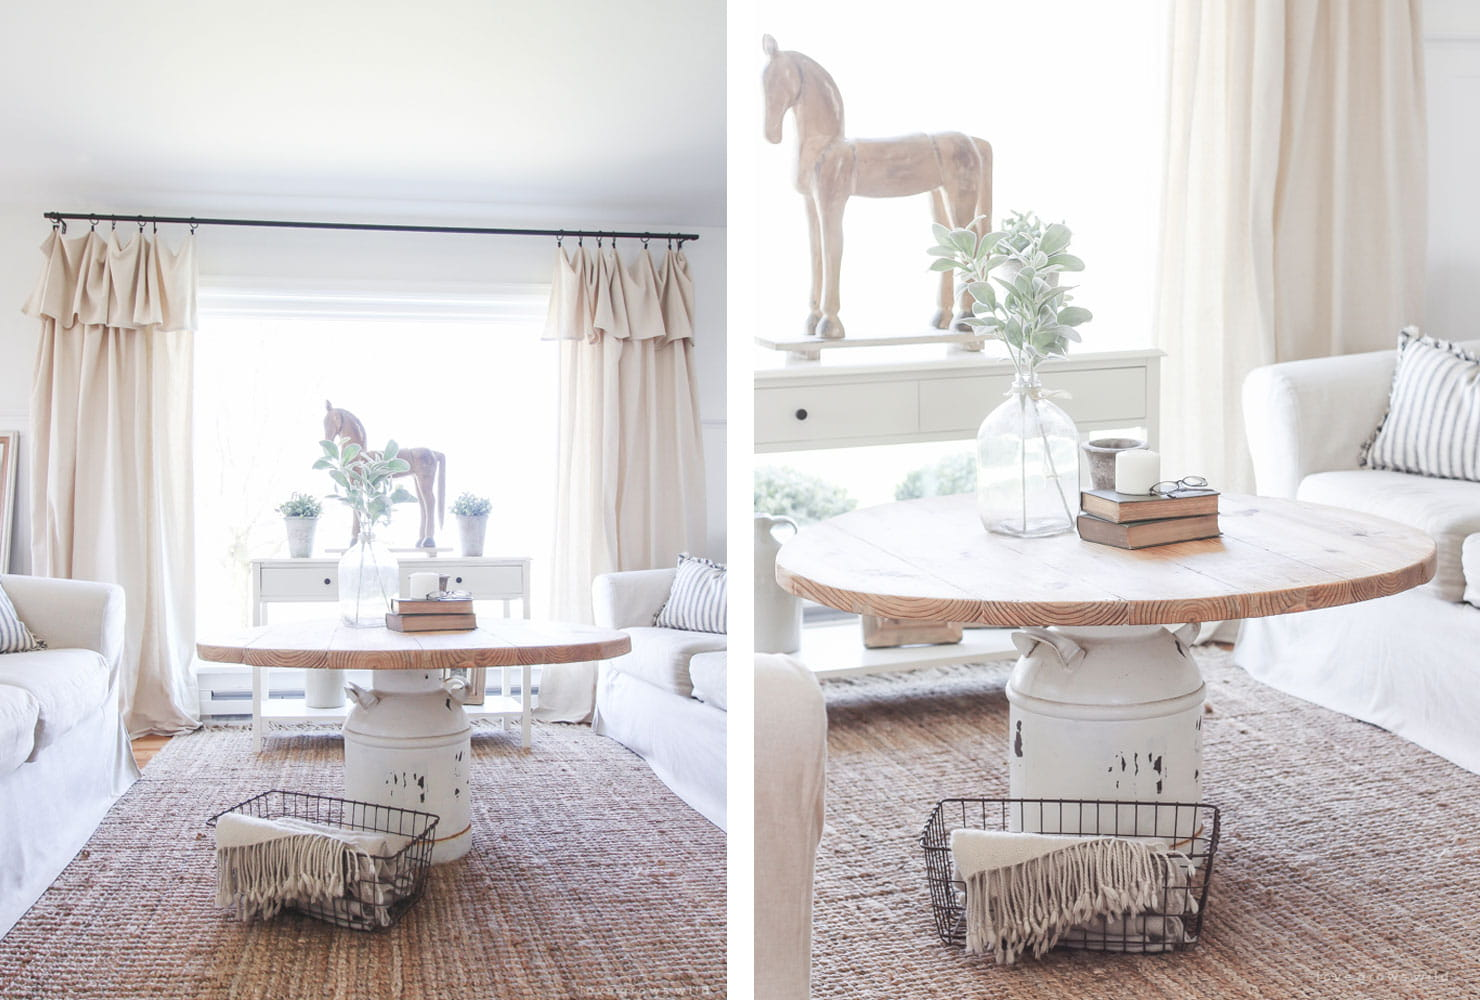 Fullsize Of Rustic Home Decor